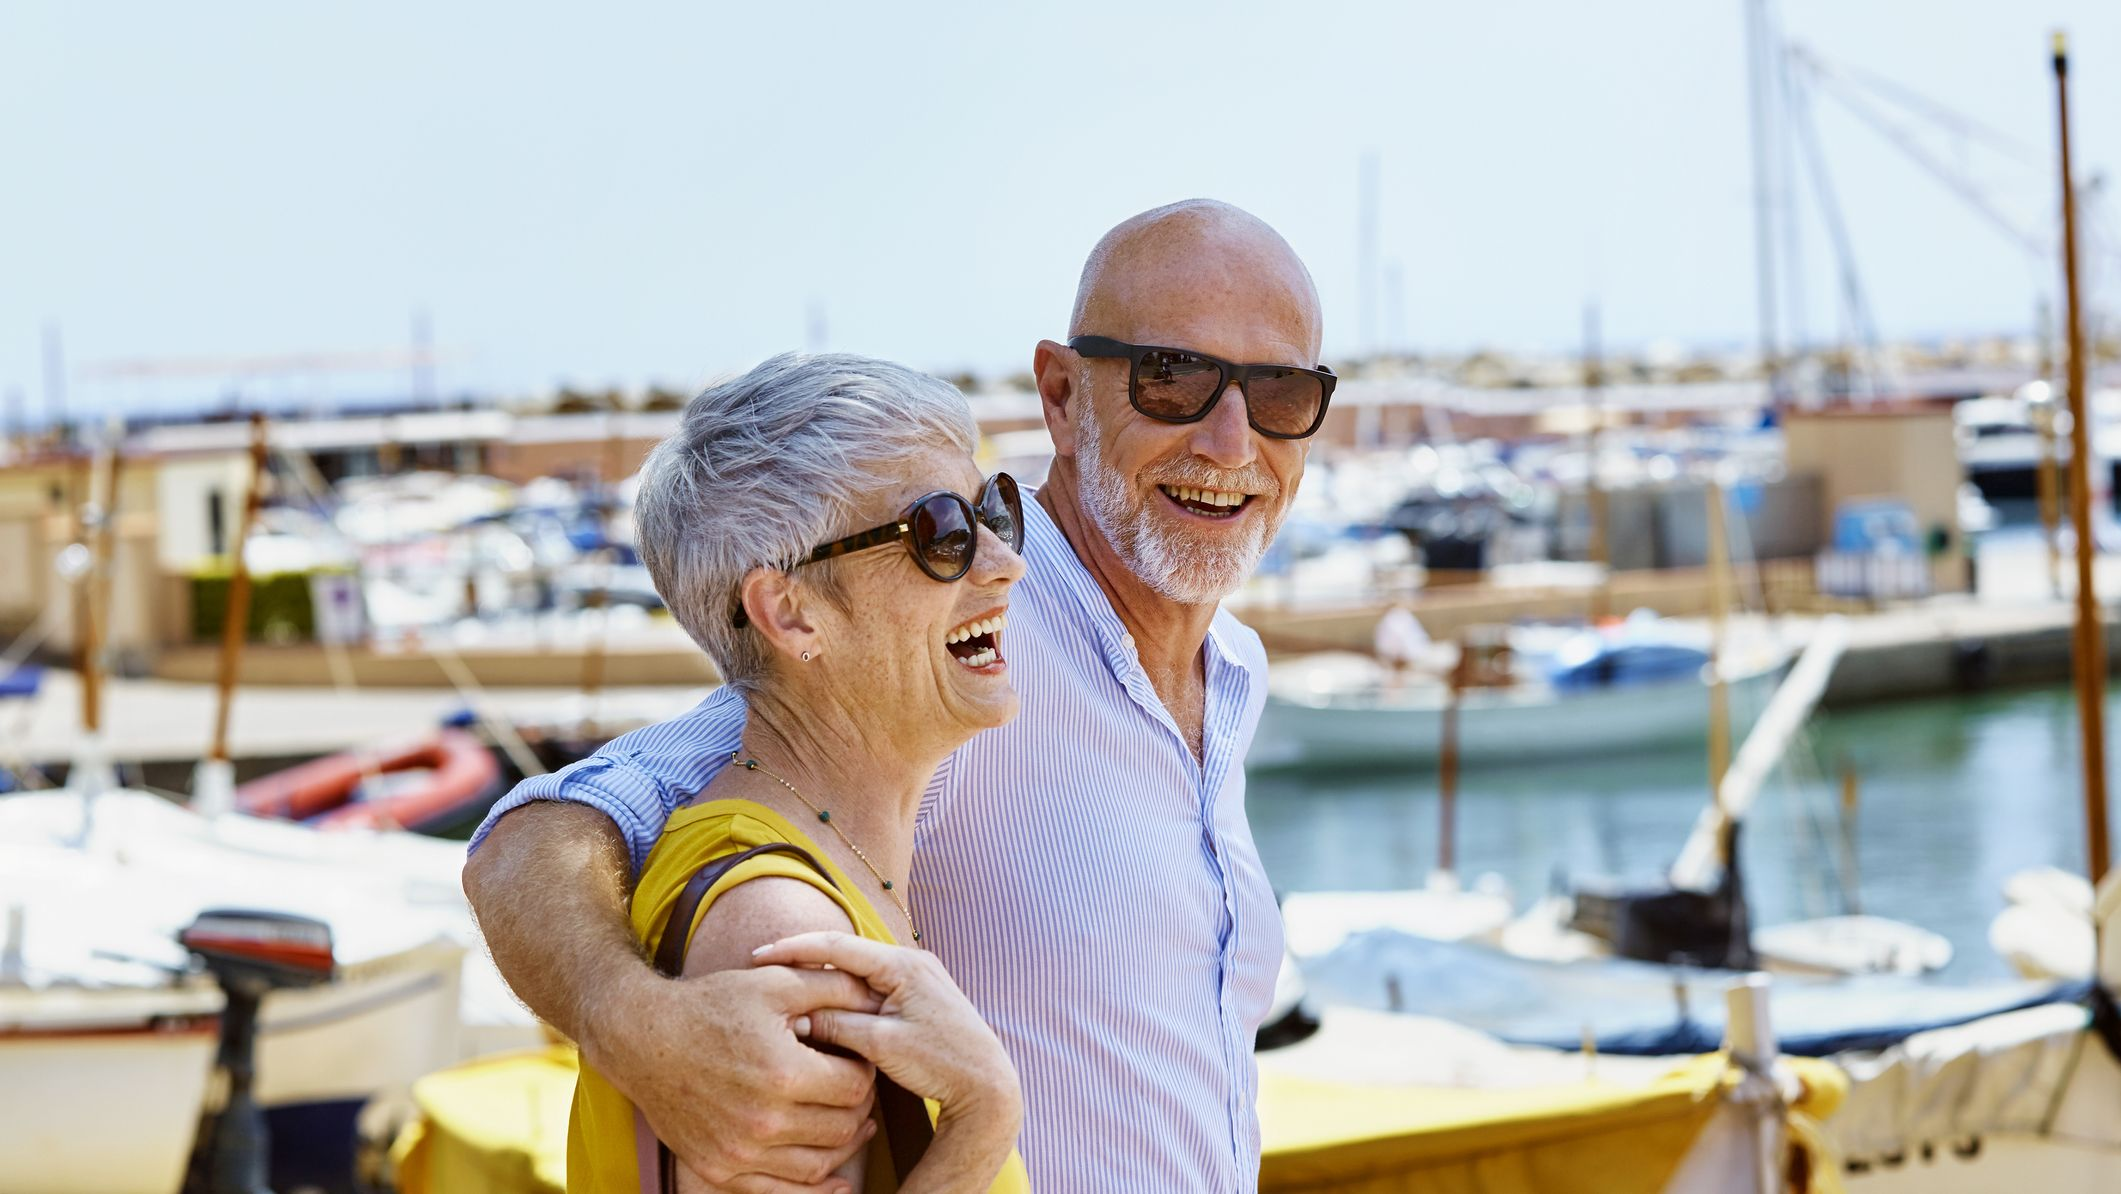 The World's 12 Most Popular Dream Retirement Locations